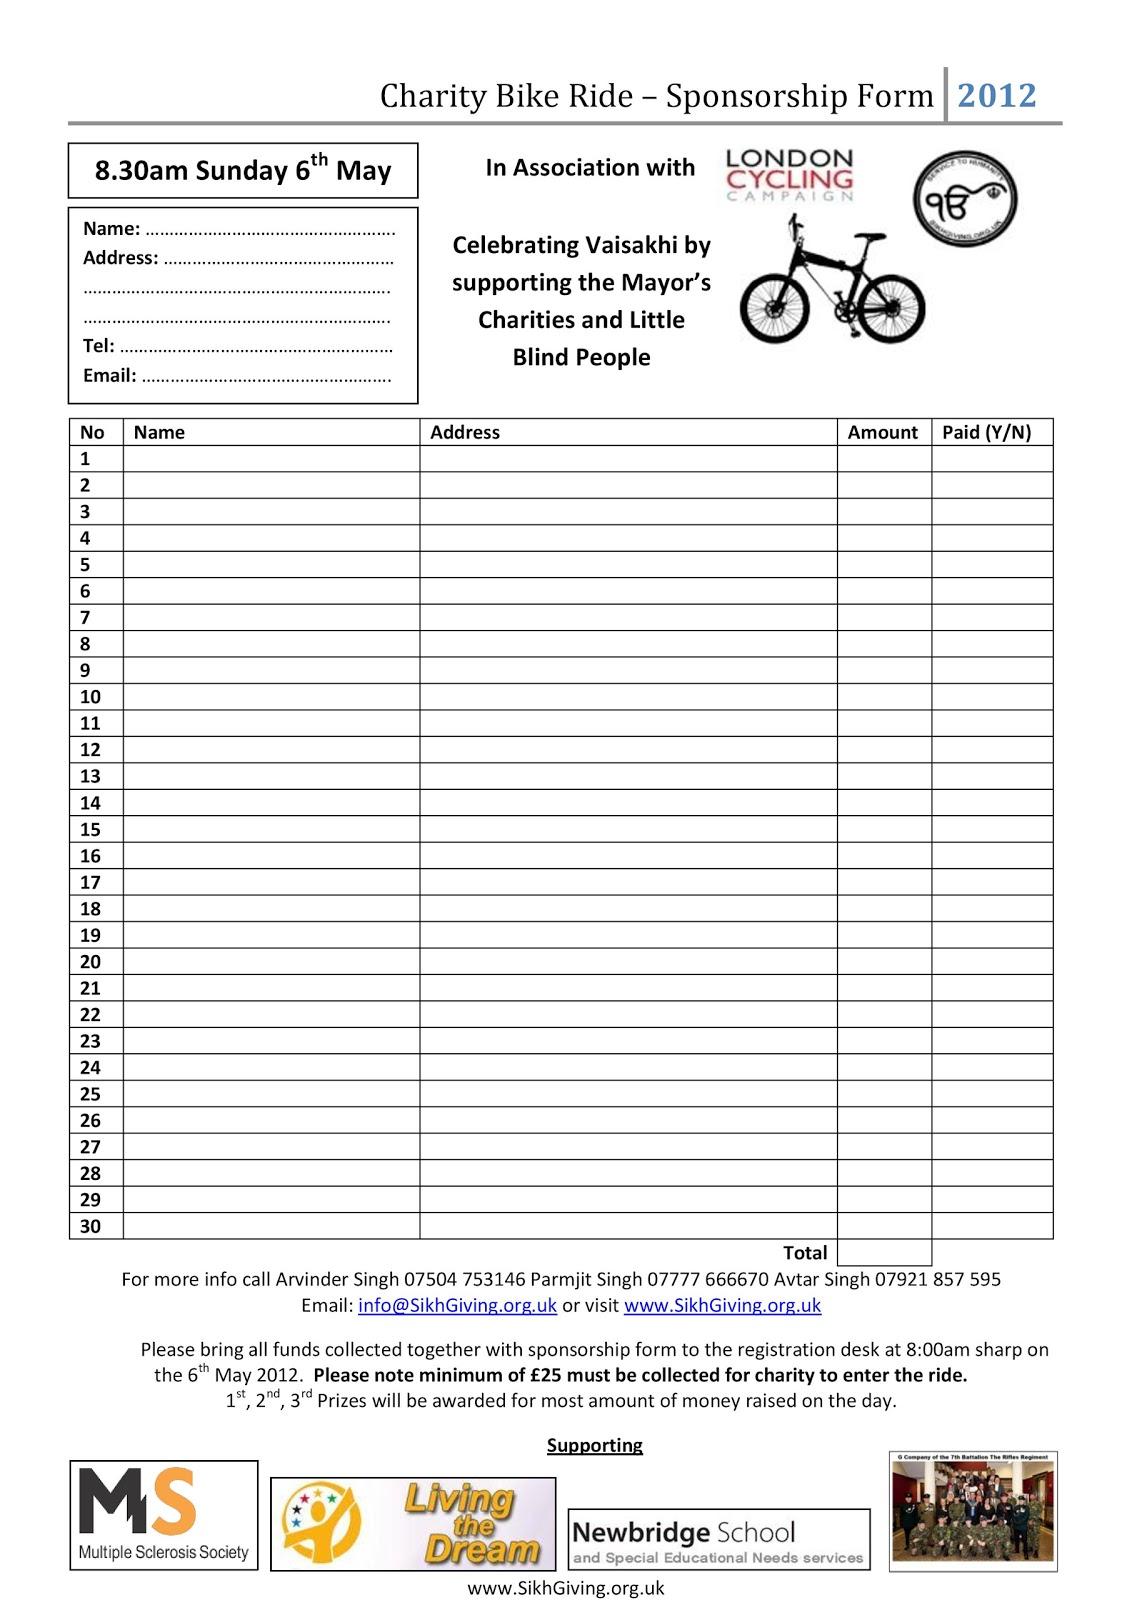 Blank sponsor form template